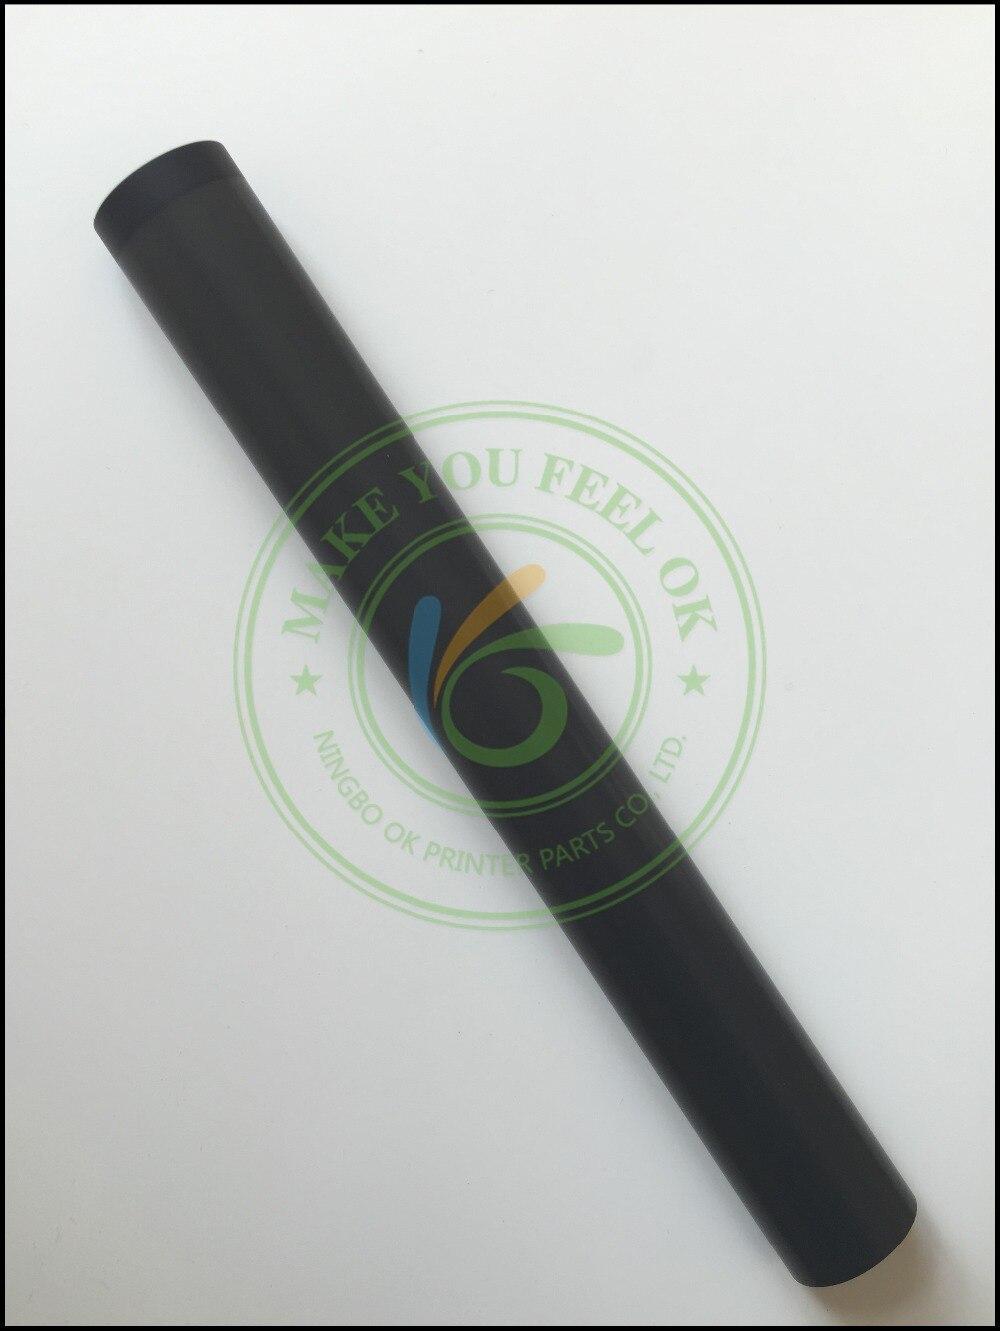 RG5-4589-Film RG5-4589 установка термозакрепляющего устройства пленочный рукав крепежной пленки тефлона для hp 1100 3100 3150 3200 5P 6 6L Canon LBP1120 800 810